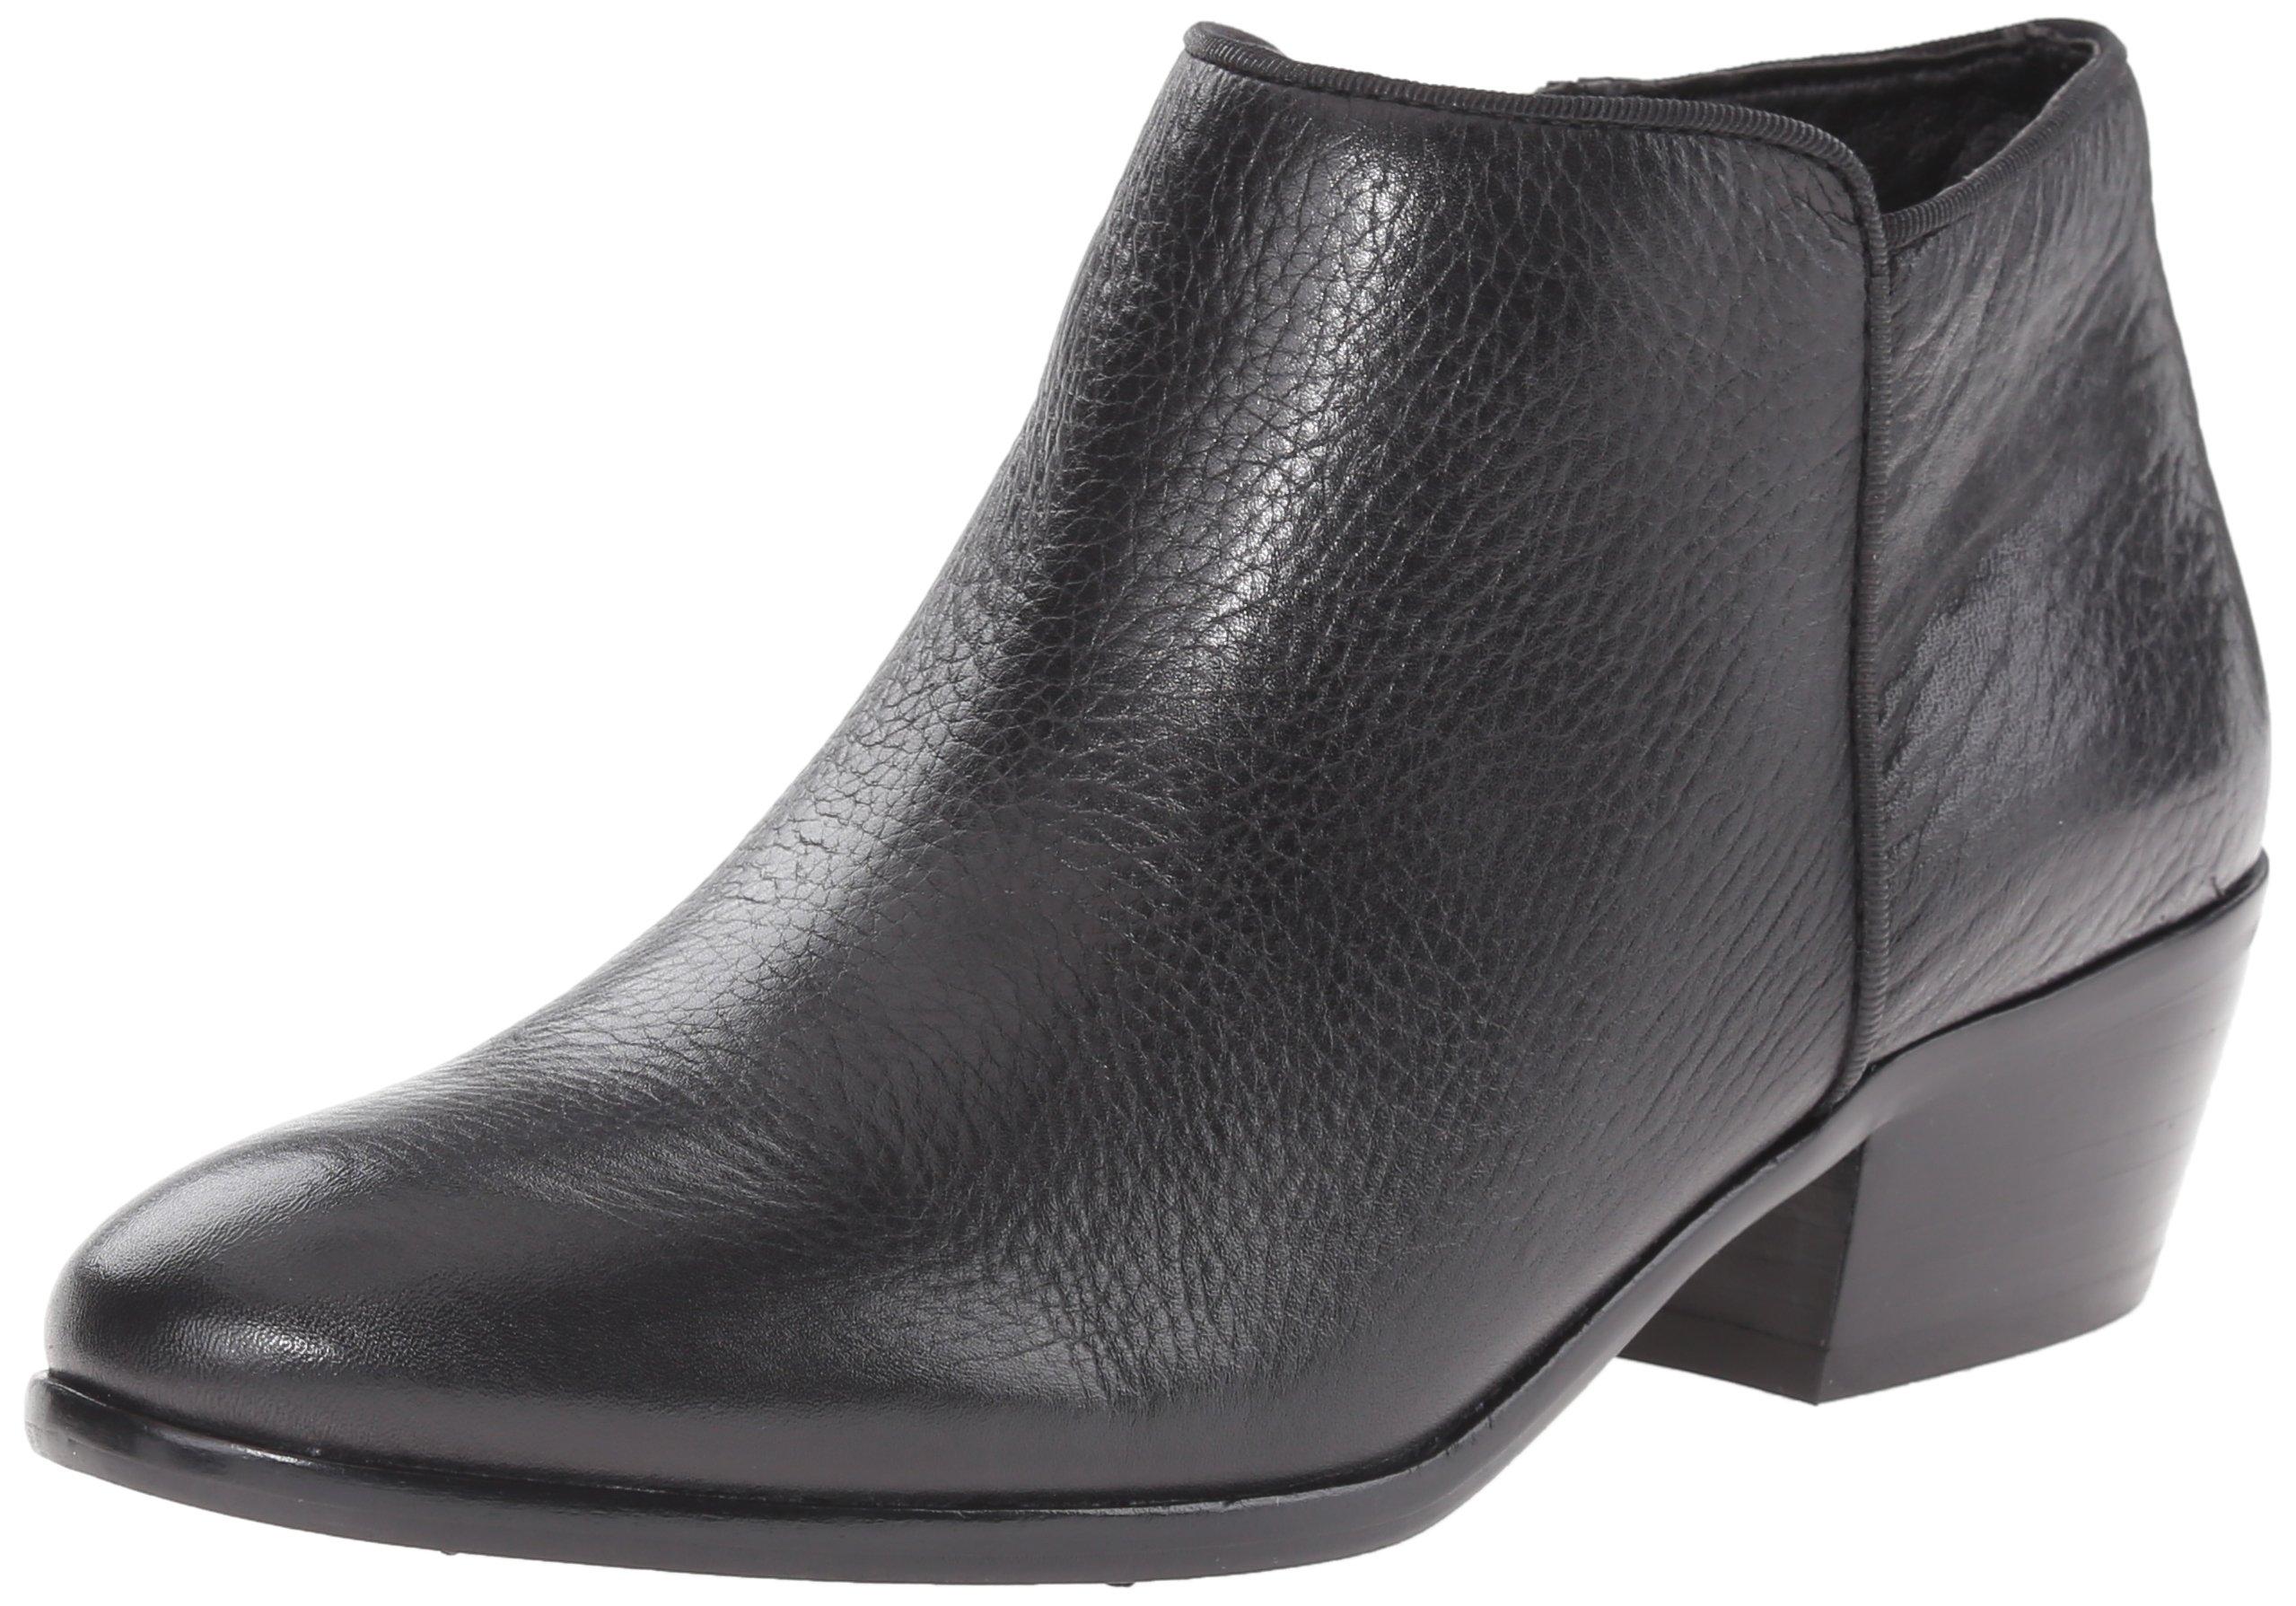 Sam Edelman Women's Petty Ankle Bootie, Black Leather, 6.5 M US